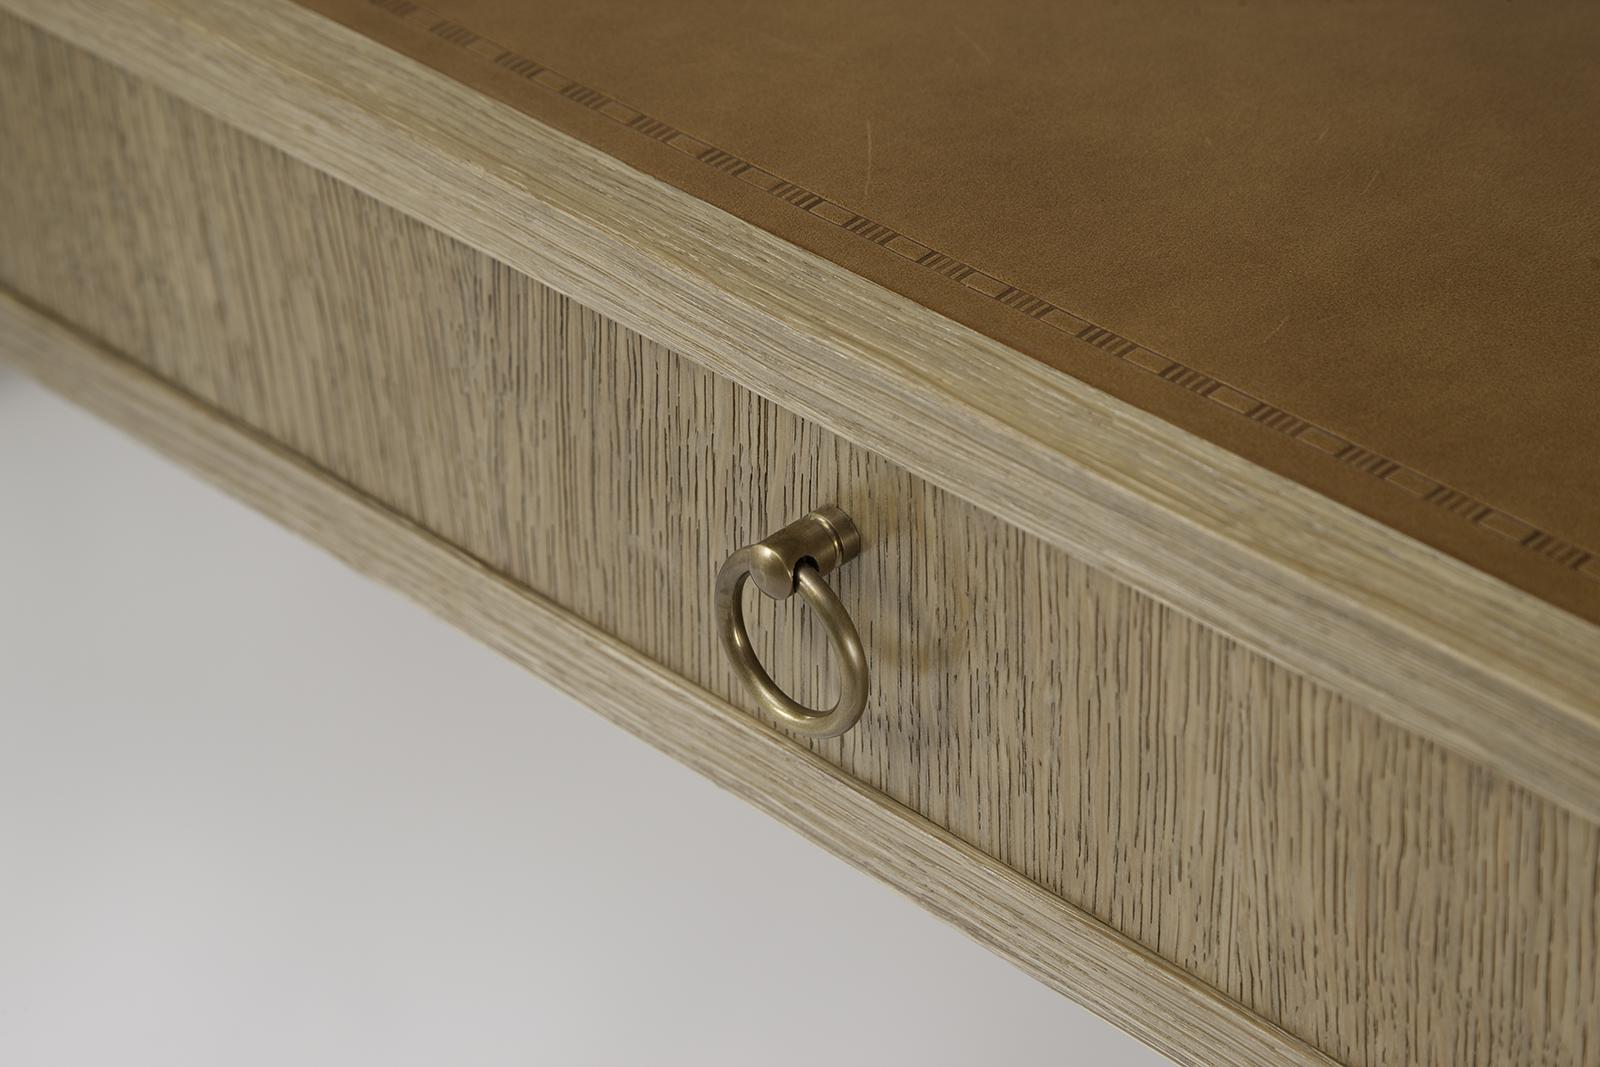 J.m. Frank Inspired Desk In Oak & Leather